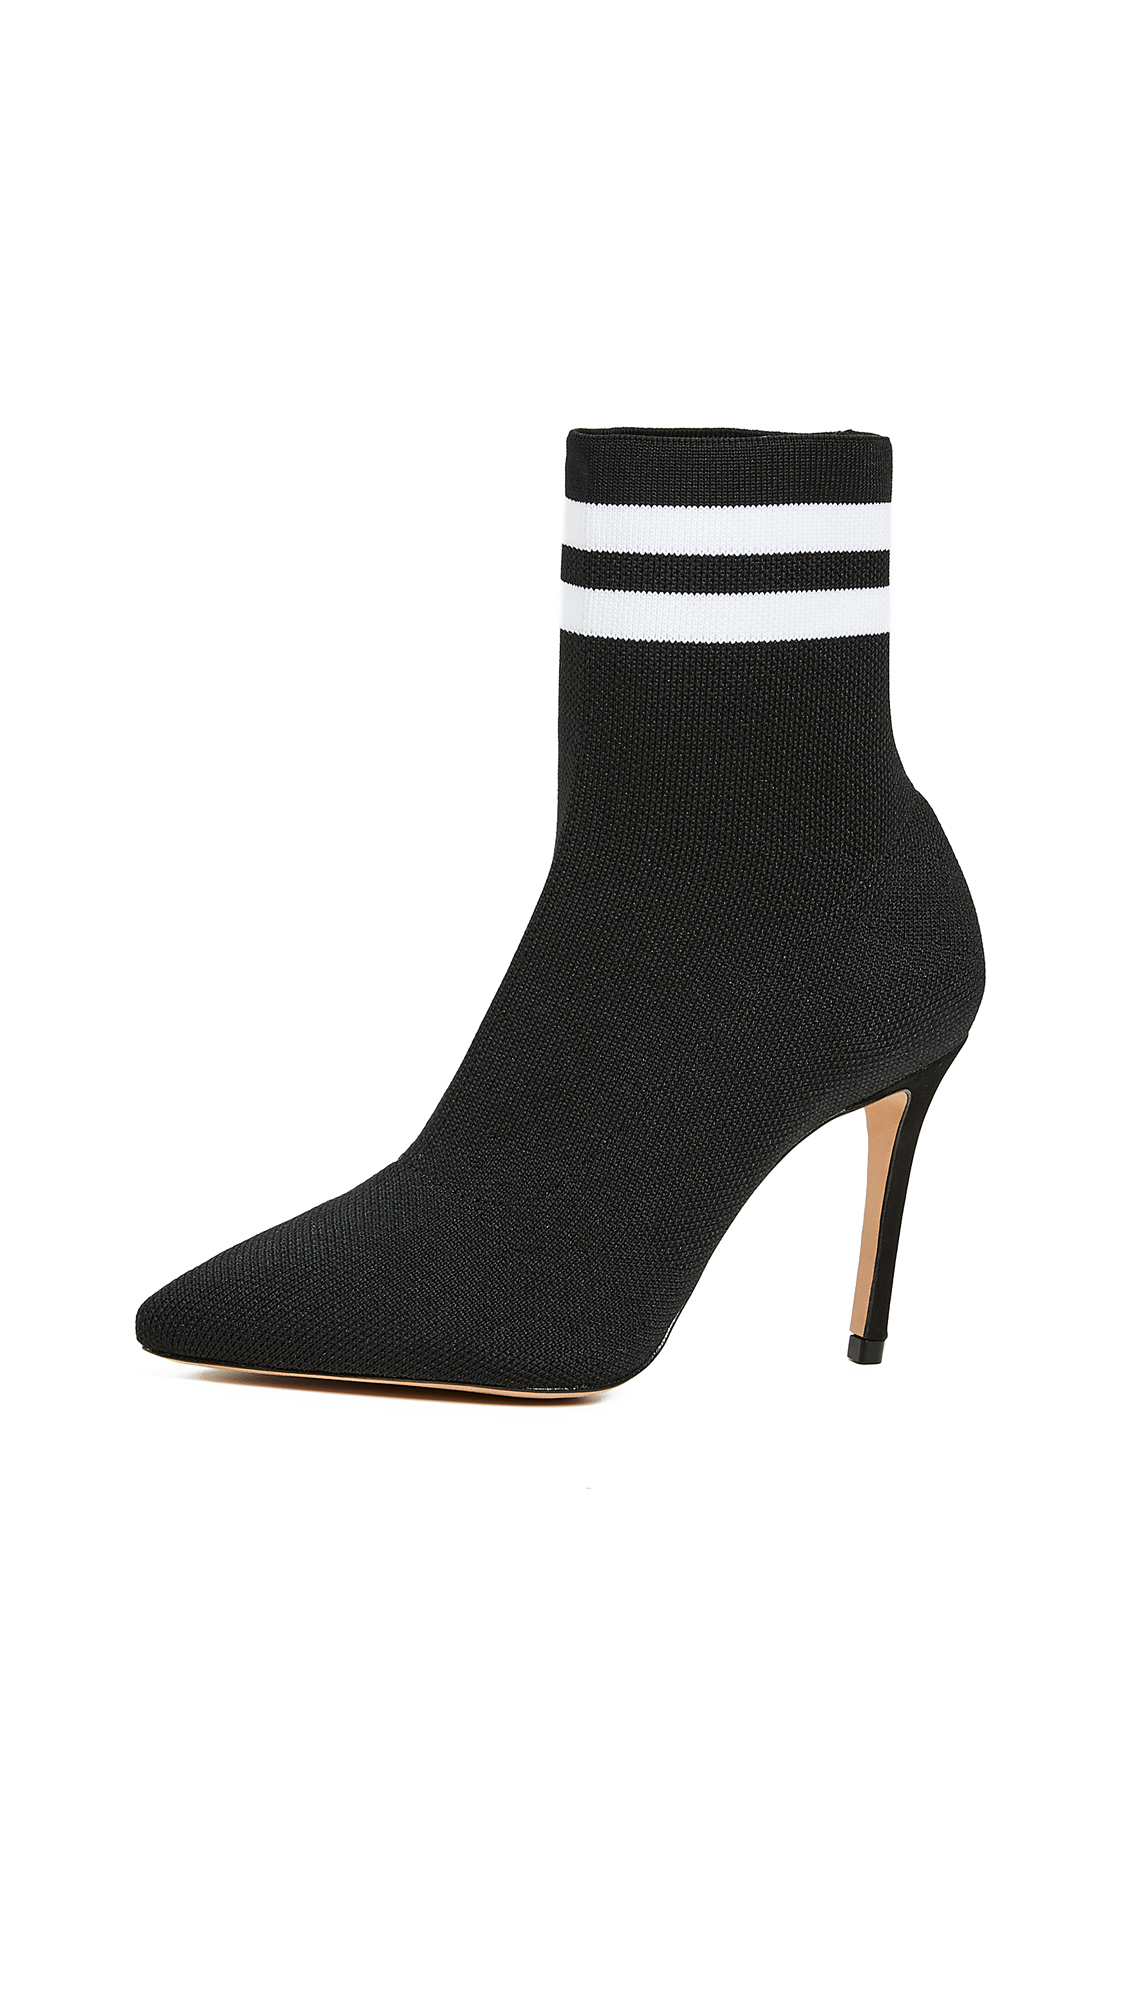 Schutz Gisela Sock Booties - Black